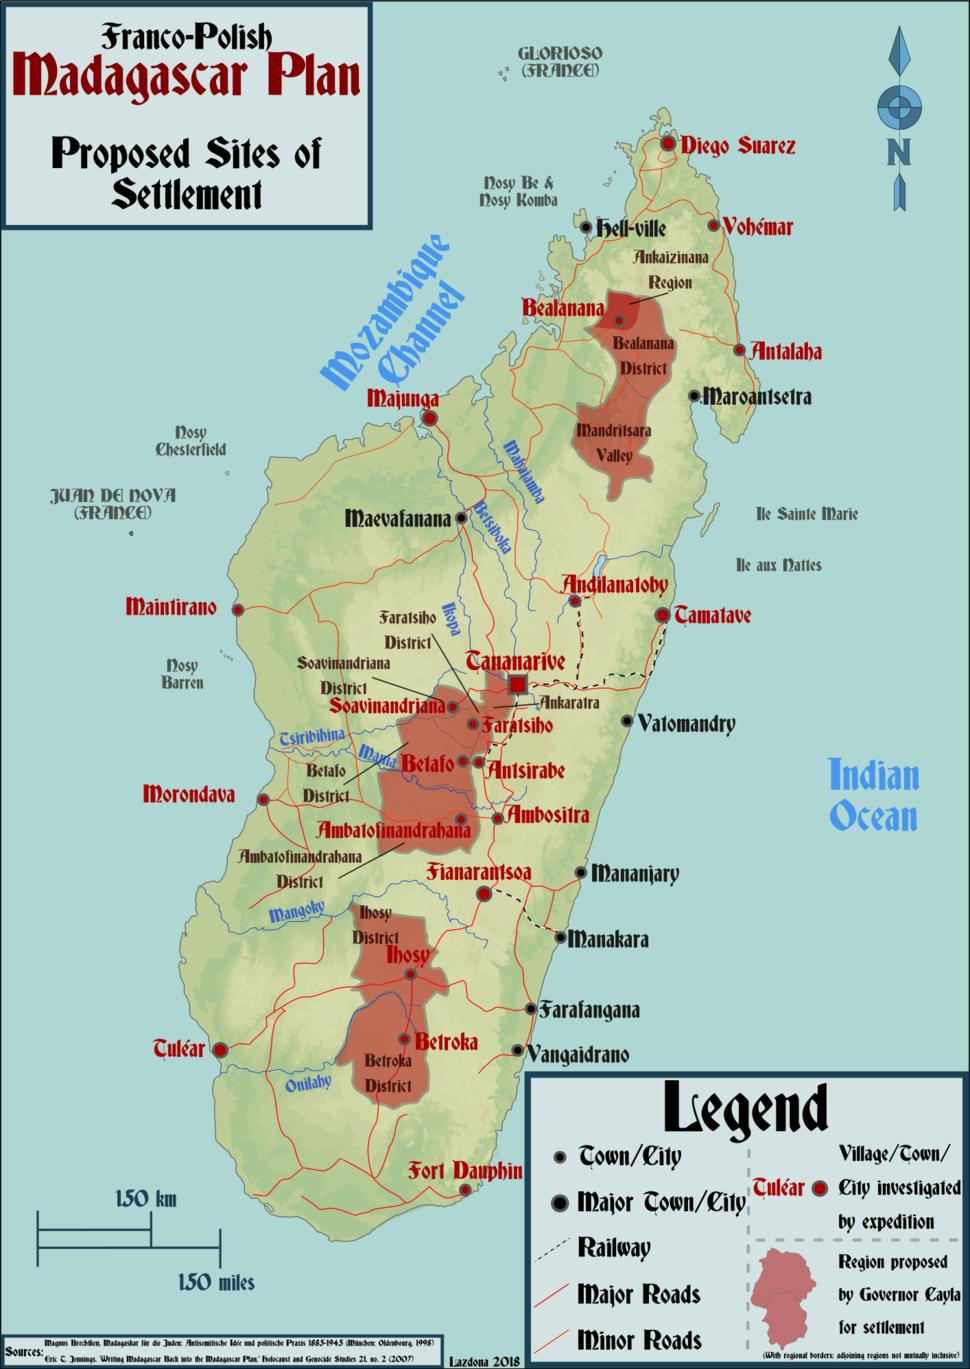 Madagascar Plan (Franco-Polish)